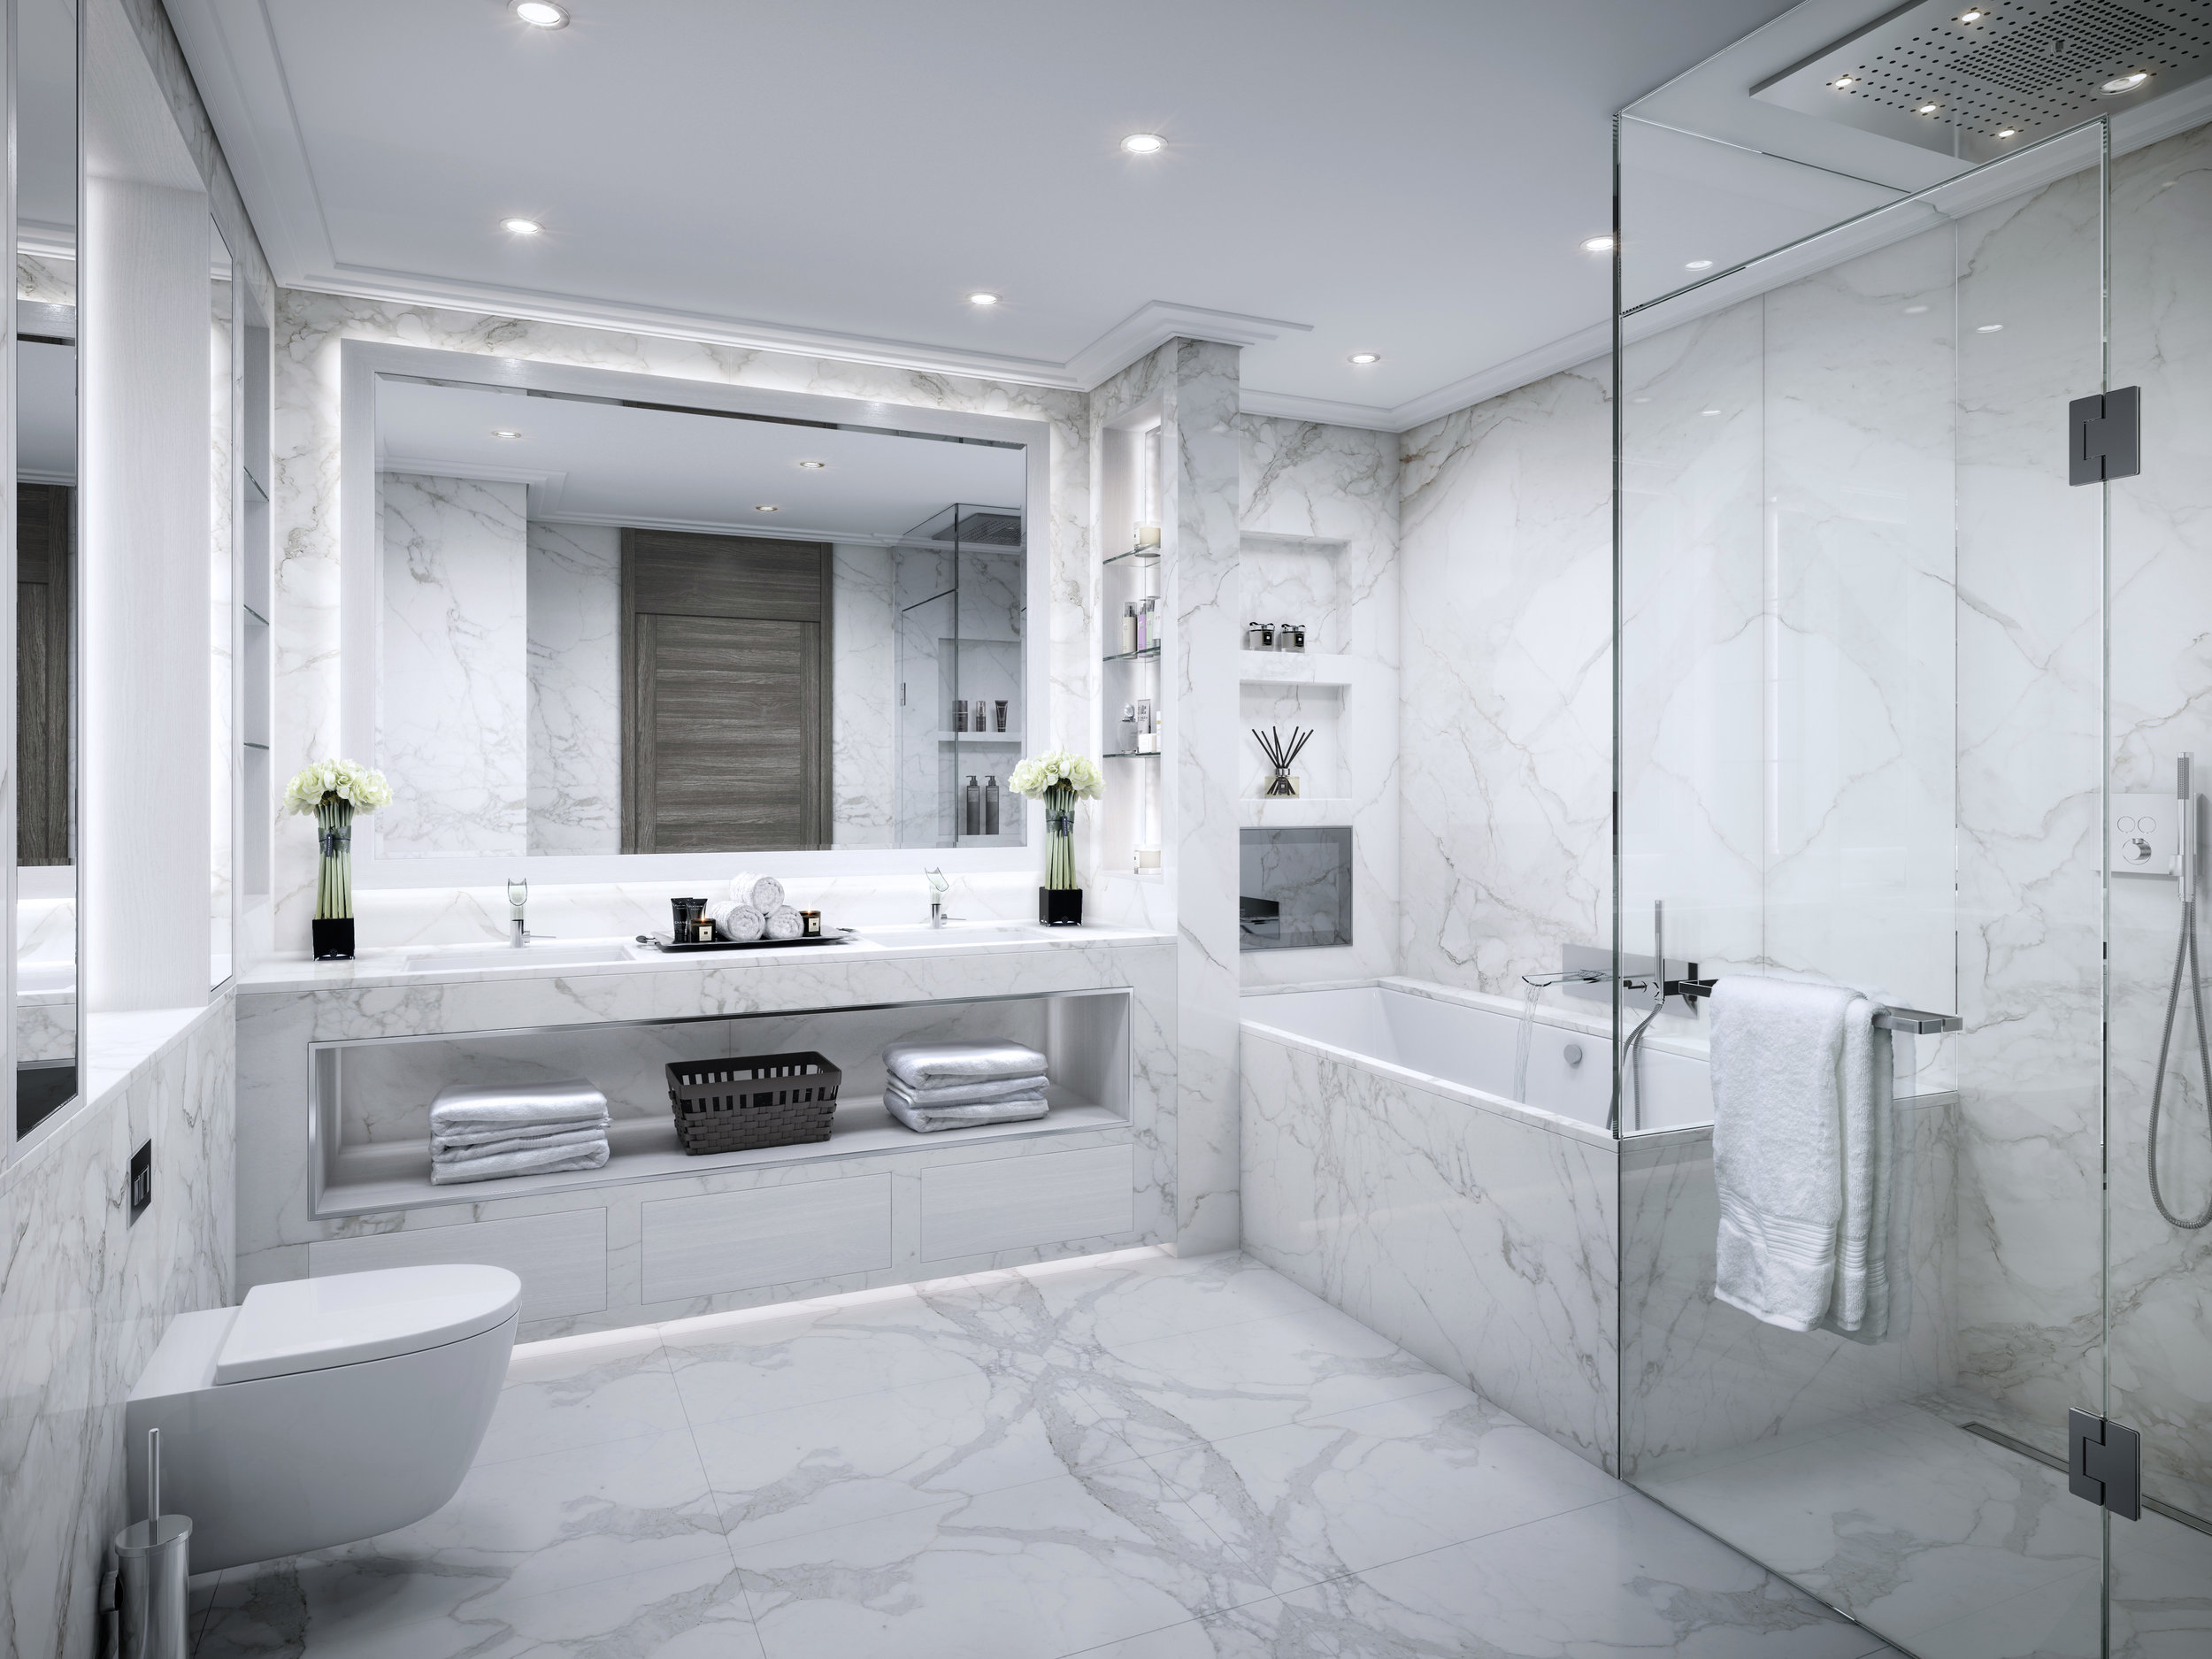 Penthouse_Bathroom_WhiteWood_highres.jpg